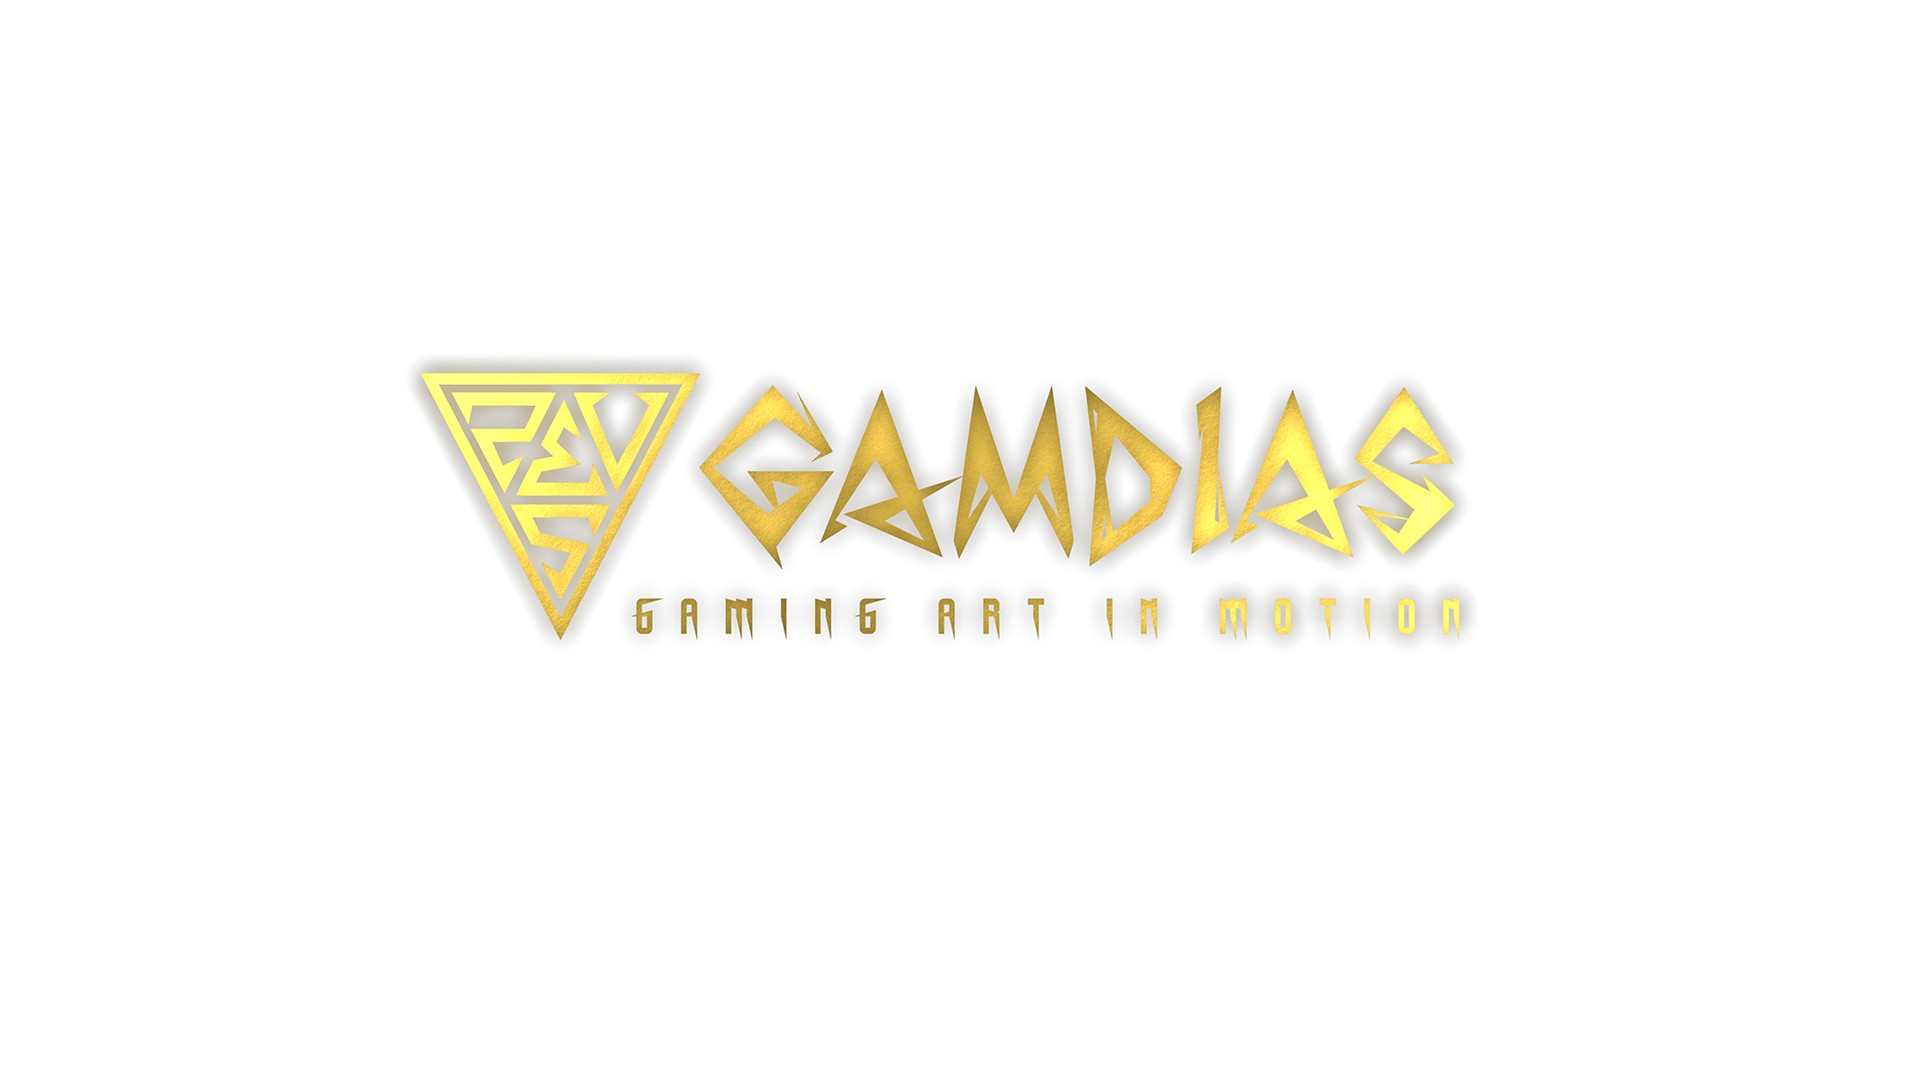 Gamdias - logo